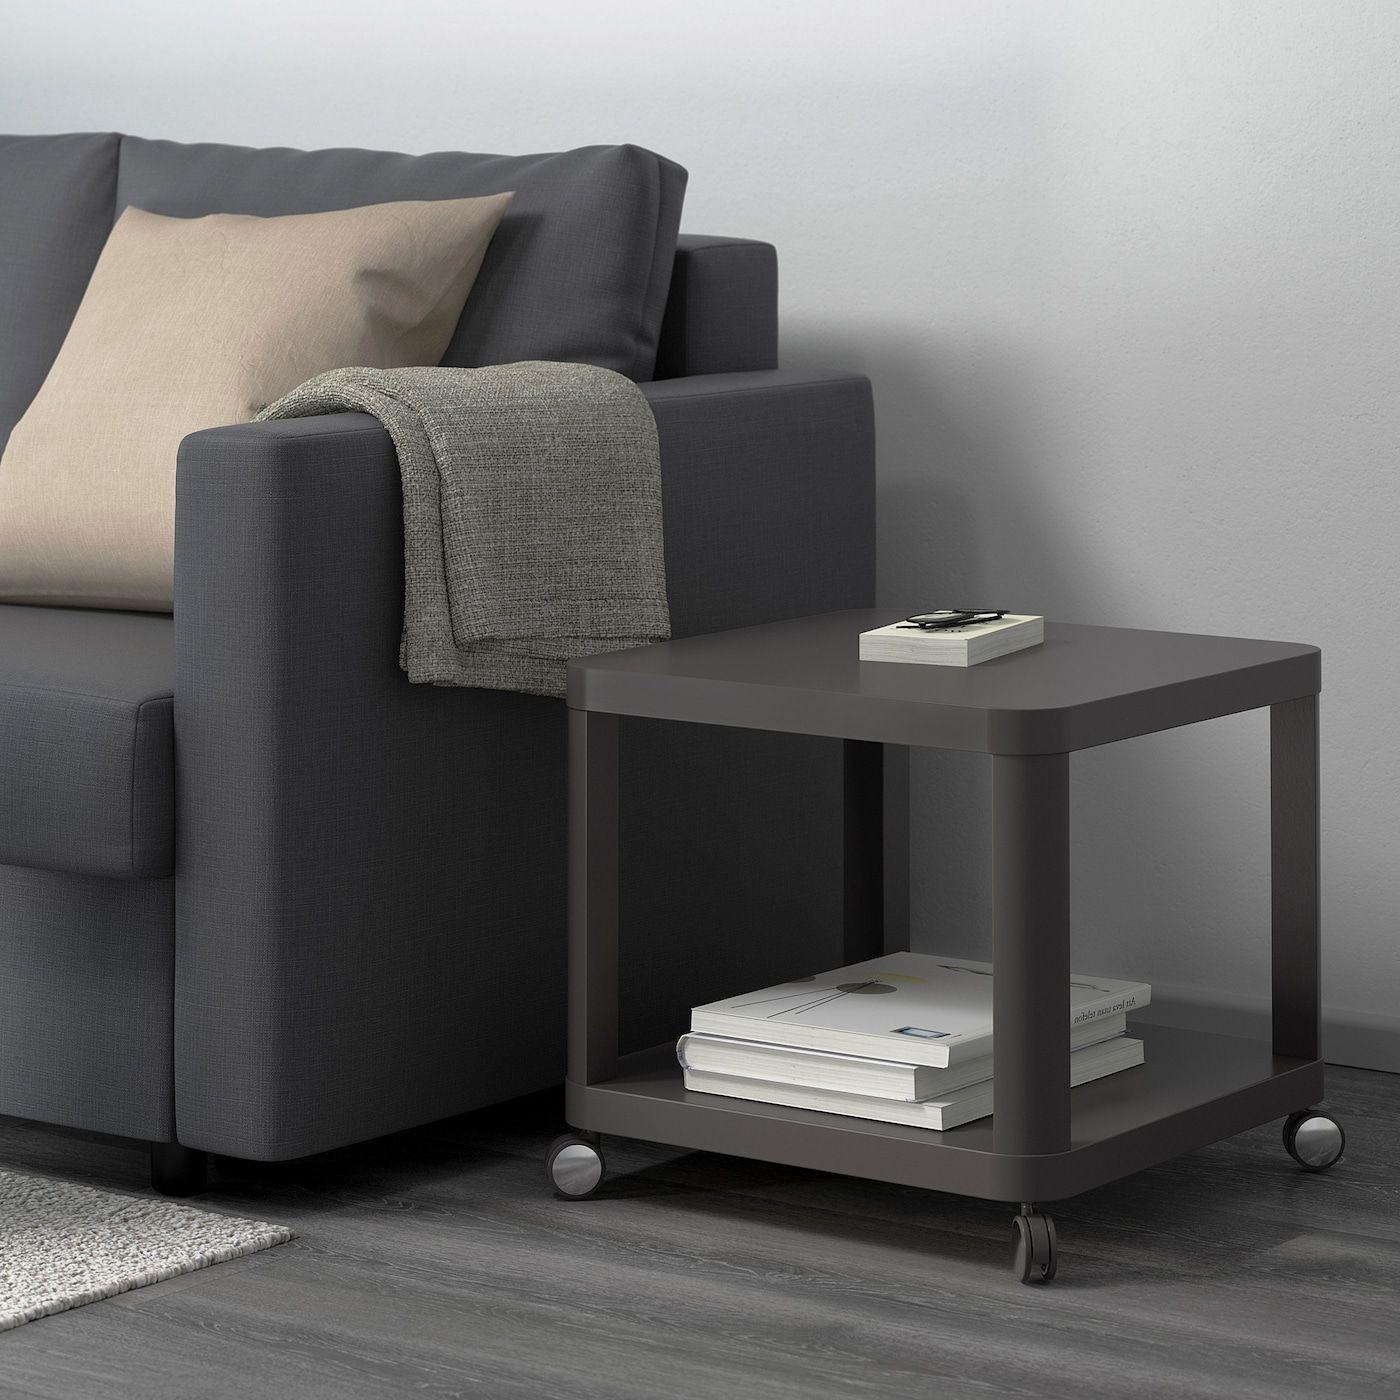 Tingby Sidebord Med Hjul Gra 50x50 Cm Ikea In 2021 Ikea Living Room Furniture Side Table Ikea Living Room [ 1400 x 1400 Pixel ]